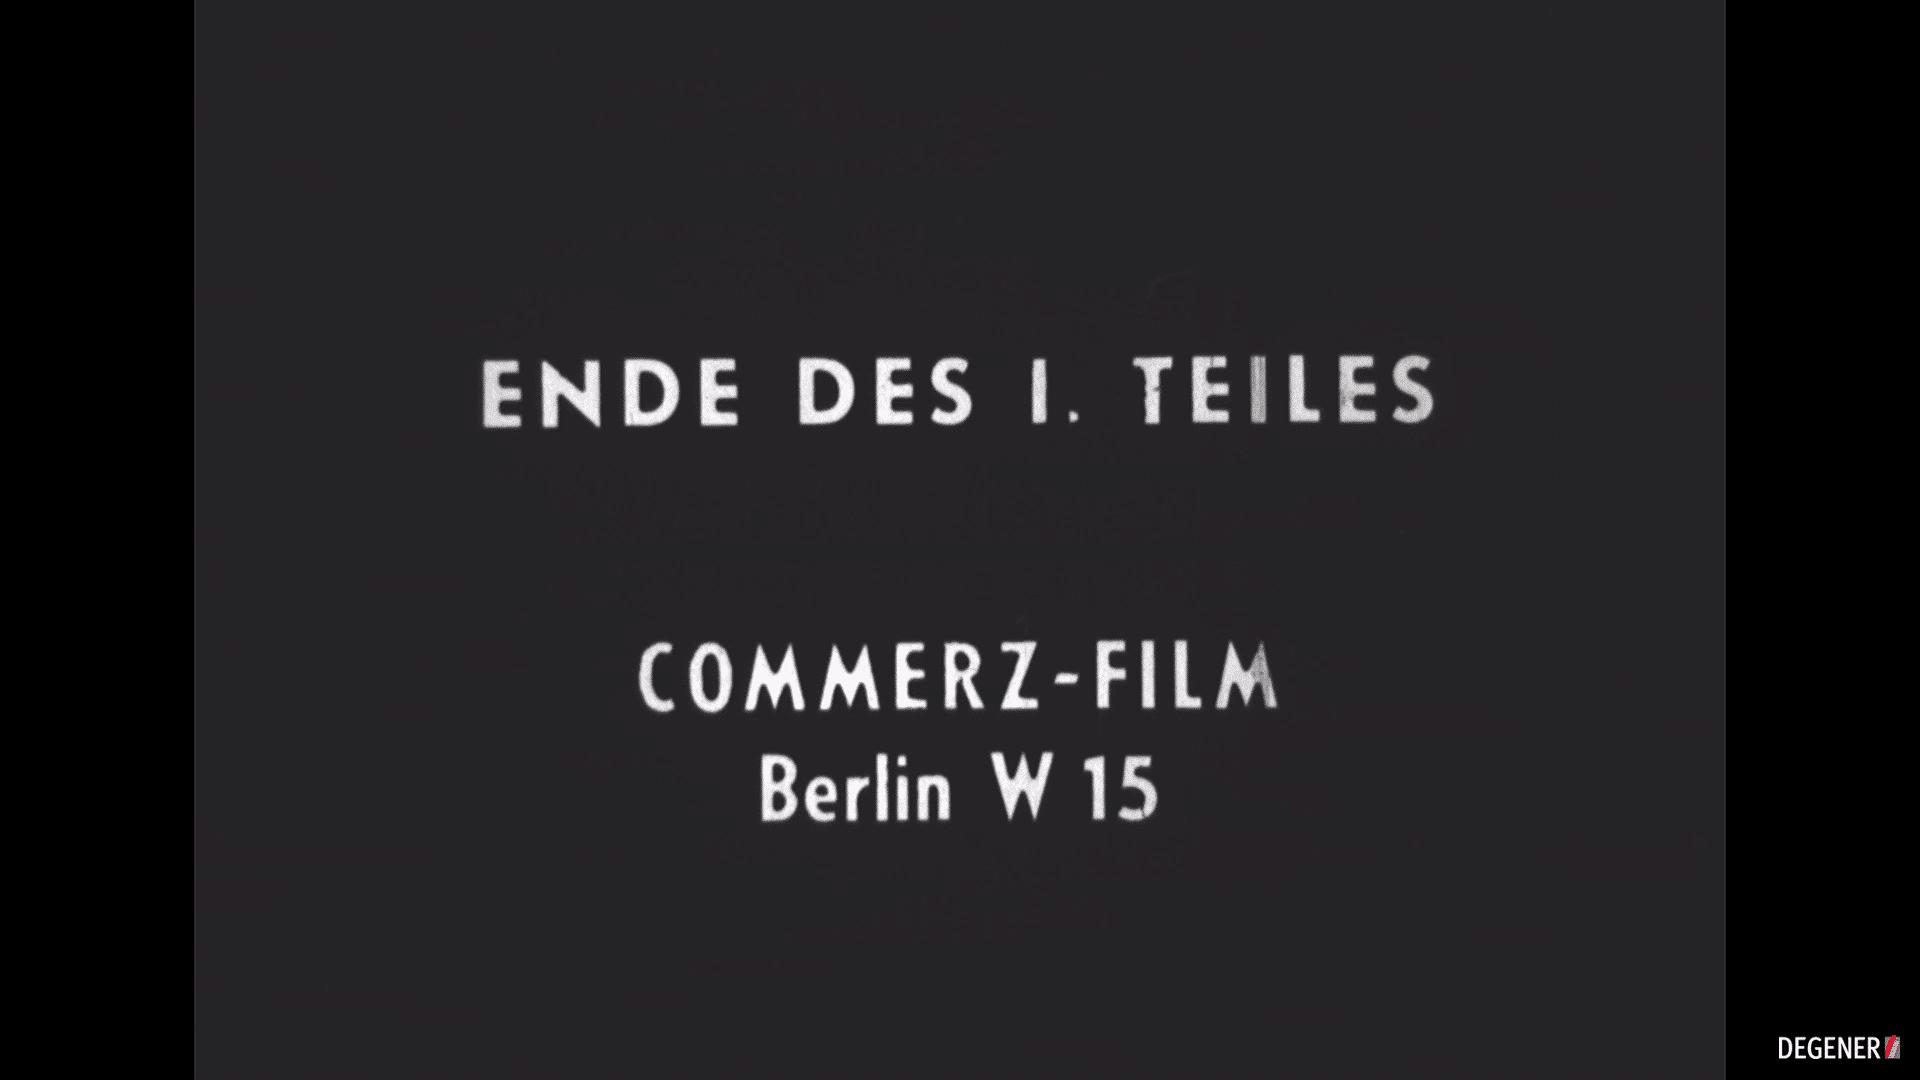 Commerz-Film